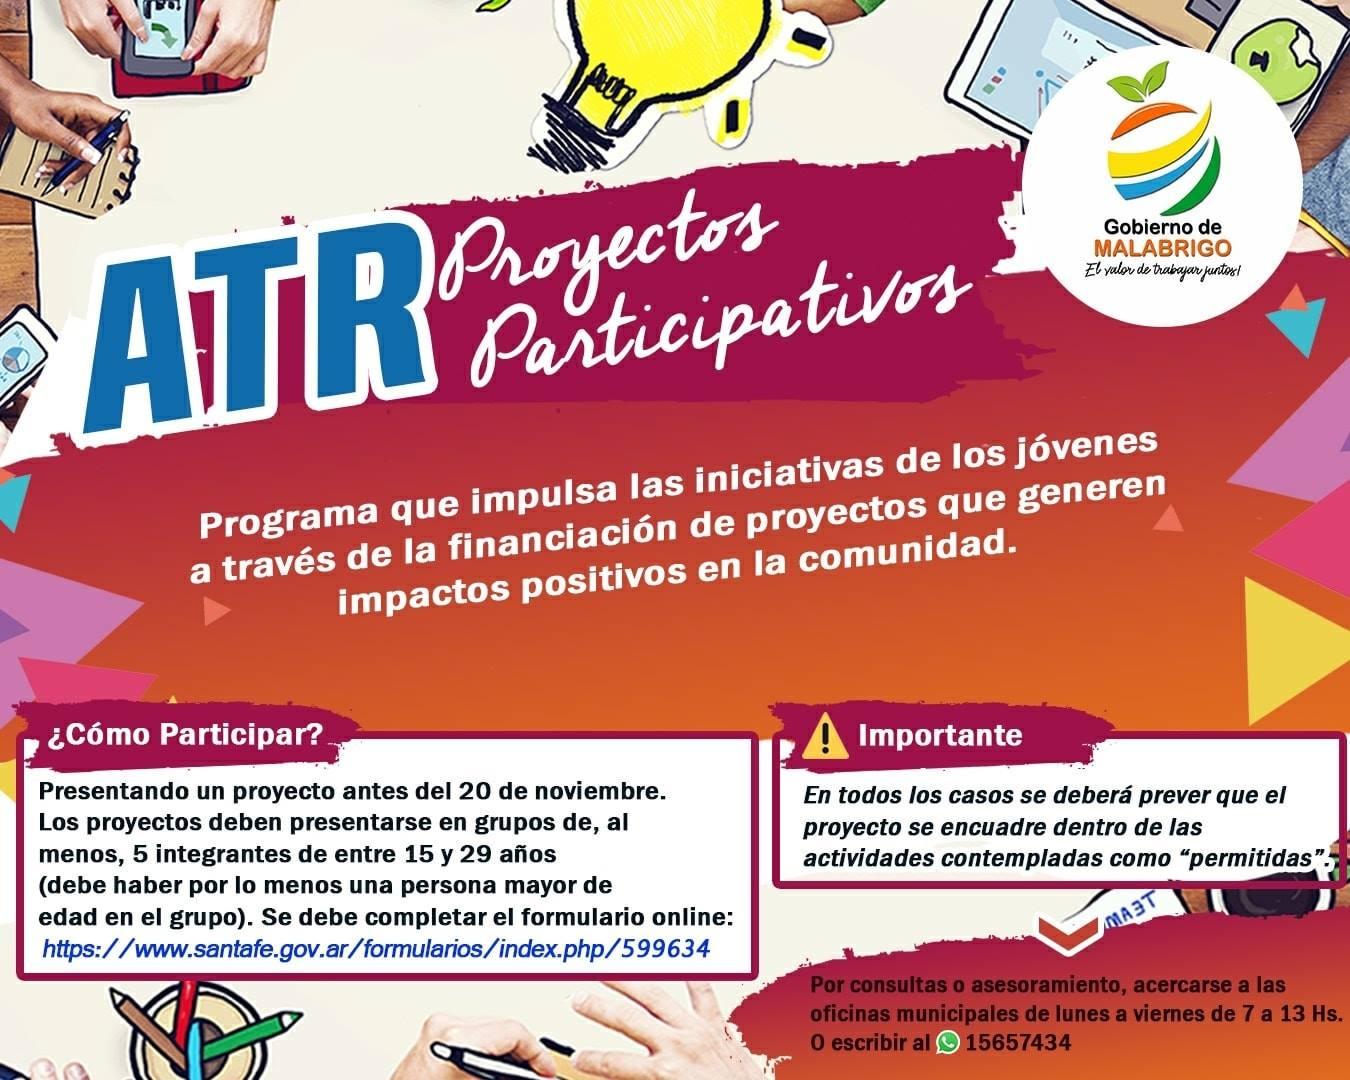 Malabrigo: ATR Proyectos Participativos